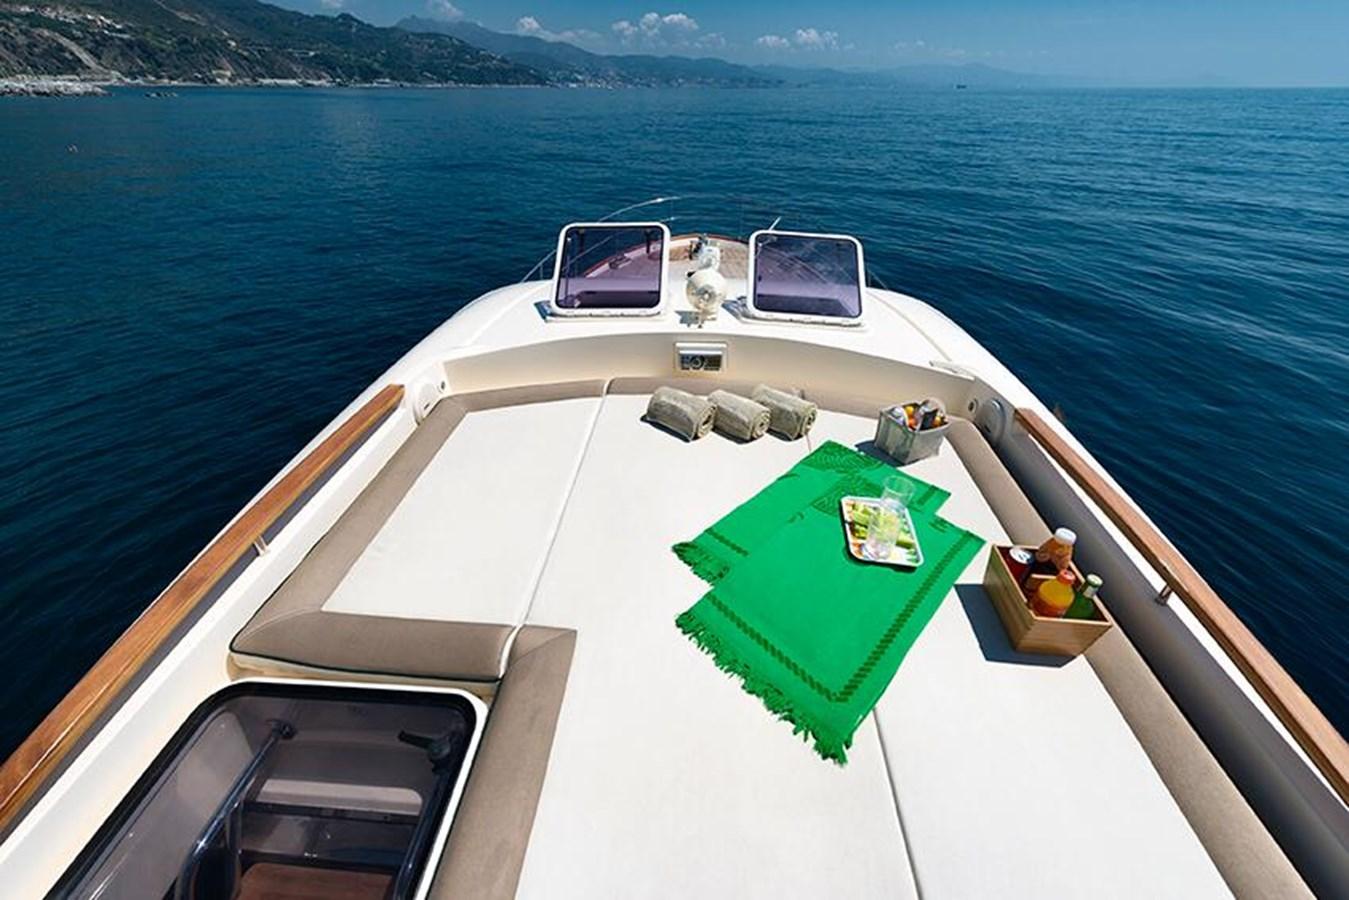 IMG-20200304-WA0001 2011 ABATI YACHTS kEYPORT 60 Motor Yacht 2879761